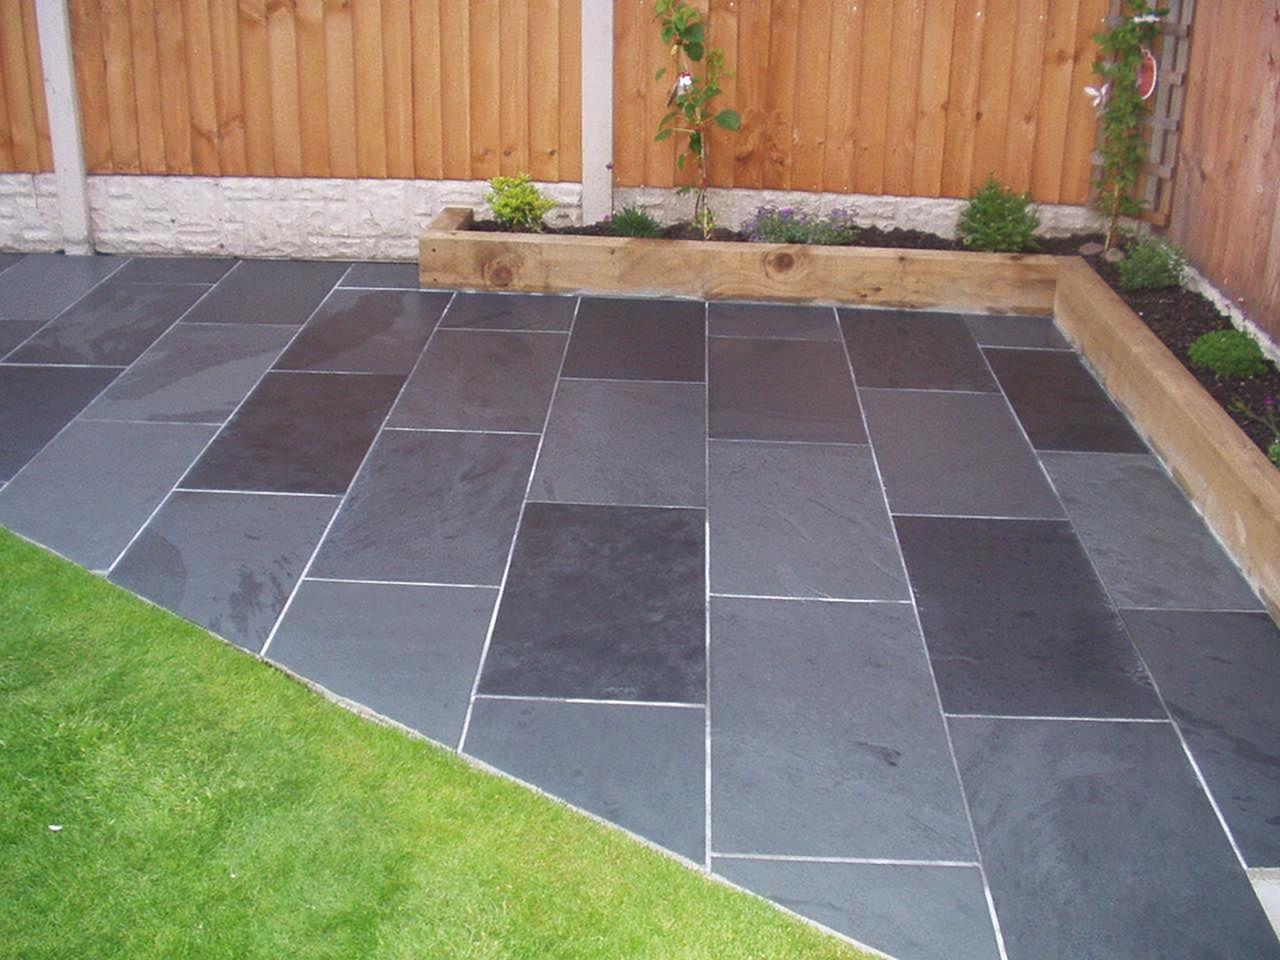 Black Slate Tile Outdoors Patio (Black Slate Tile Outdoors ... on Slate Patio Ideas id=20463